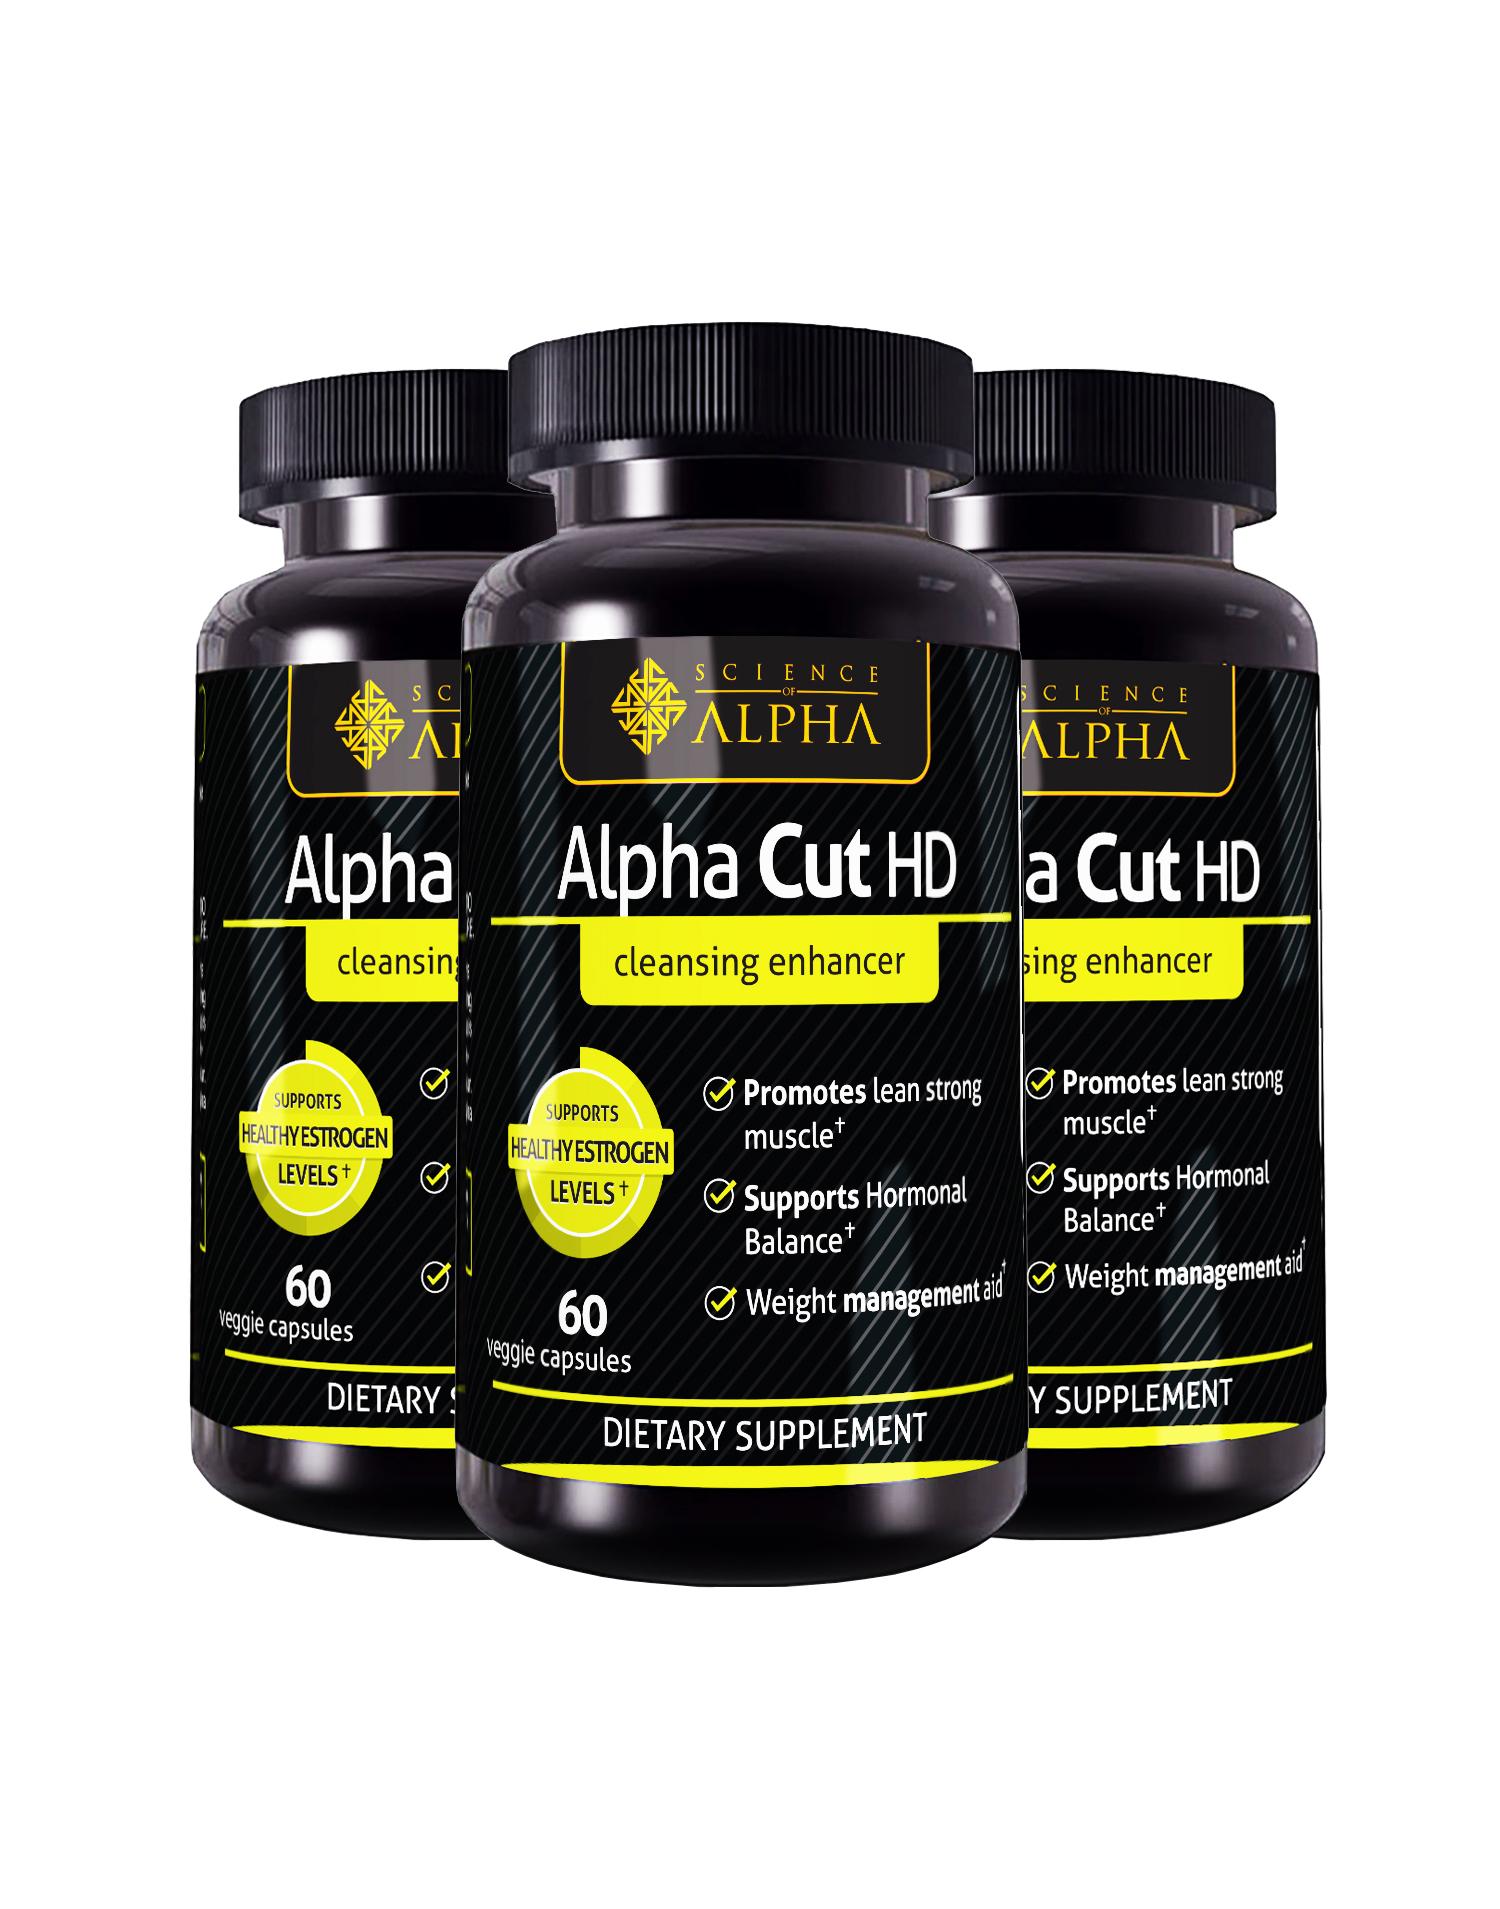 Alpha Cup HD